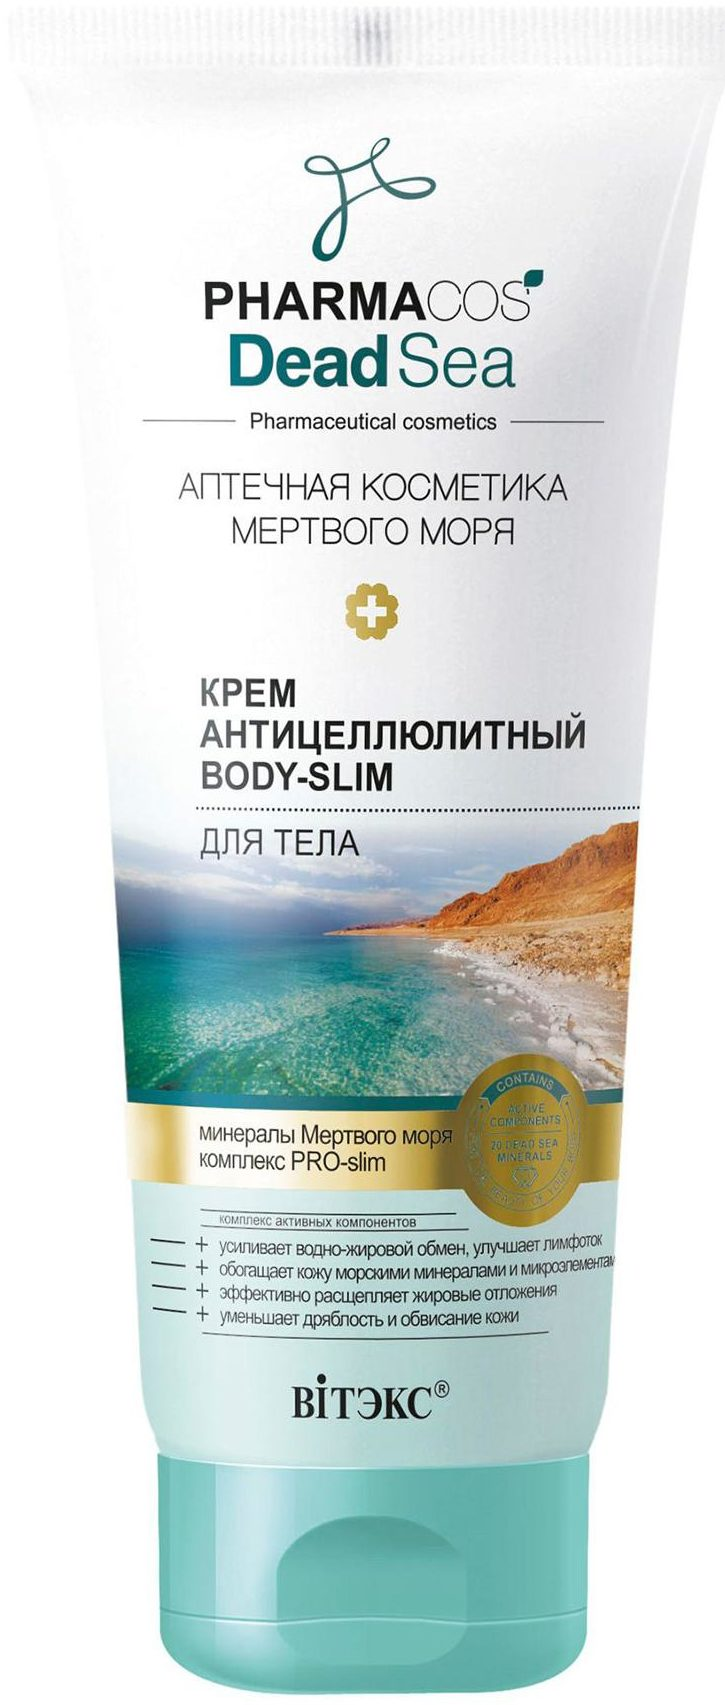 Витэкс крем Dead Sea антицеллюлитный Body-Slim